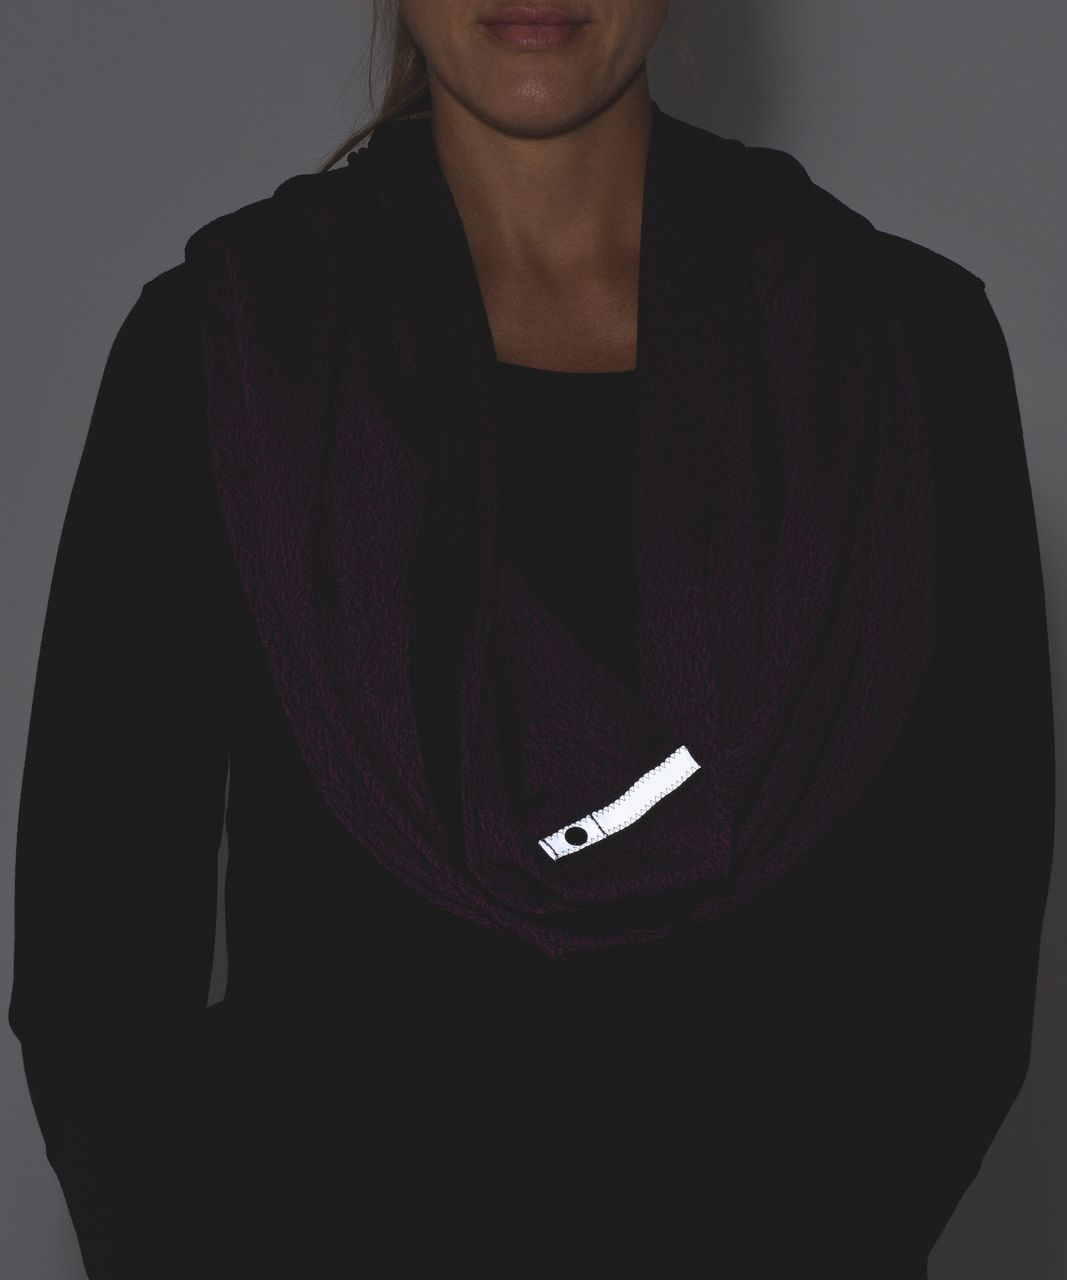 Lululemon Vinyasa Wrap - Running Luon Spray Jacquard Aurora Black / Black